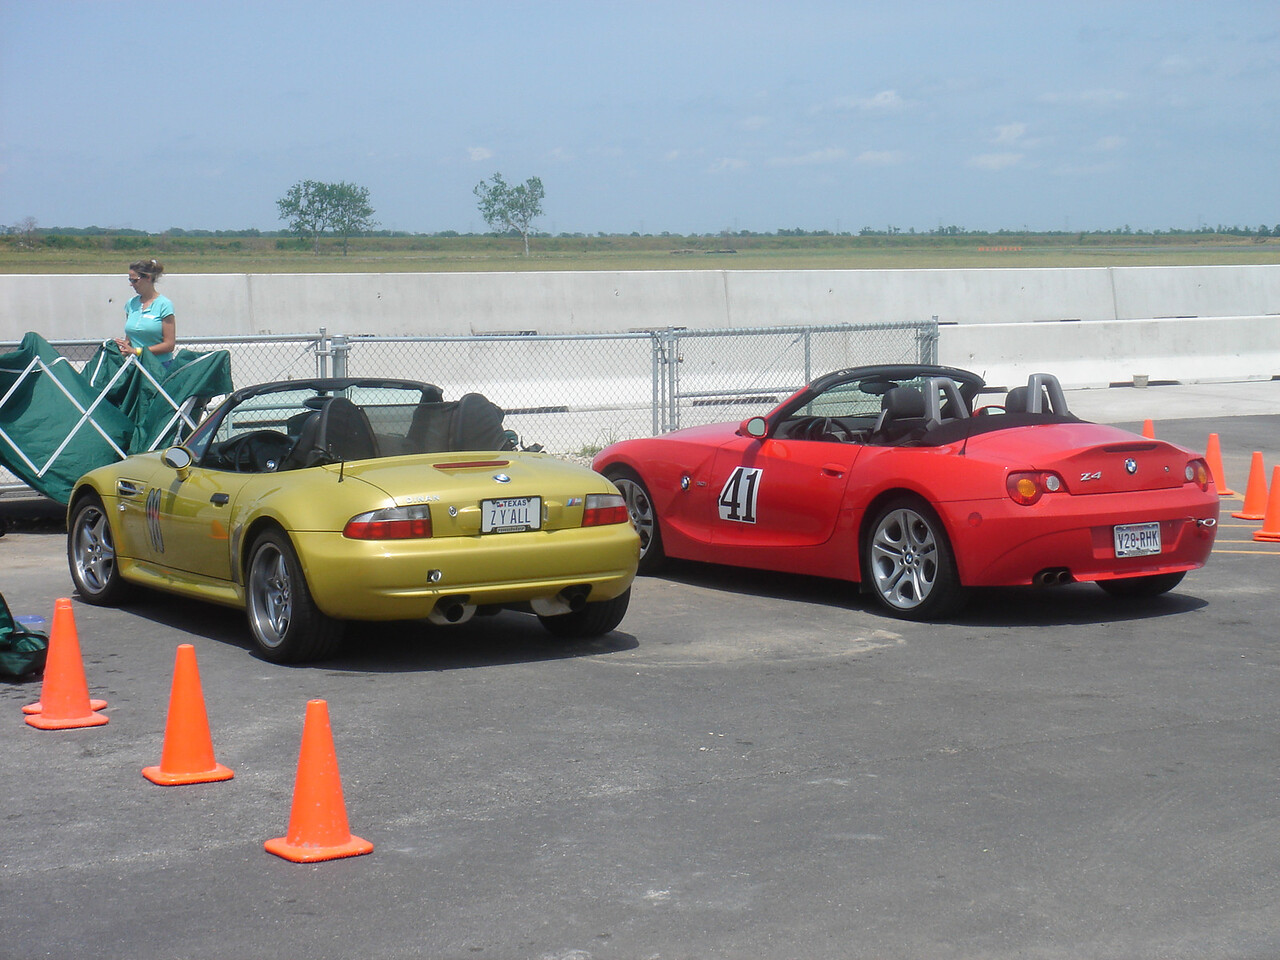 315hp Z4 Roadster and Z4